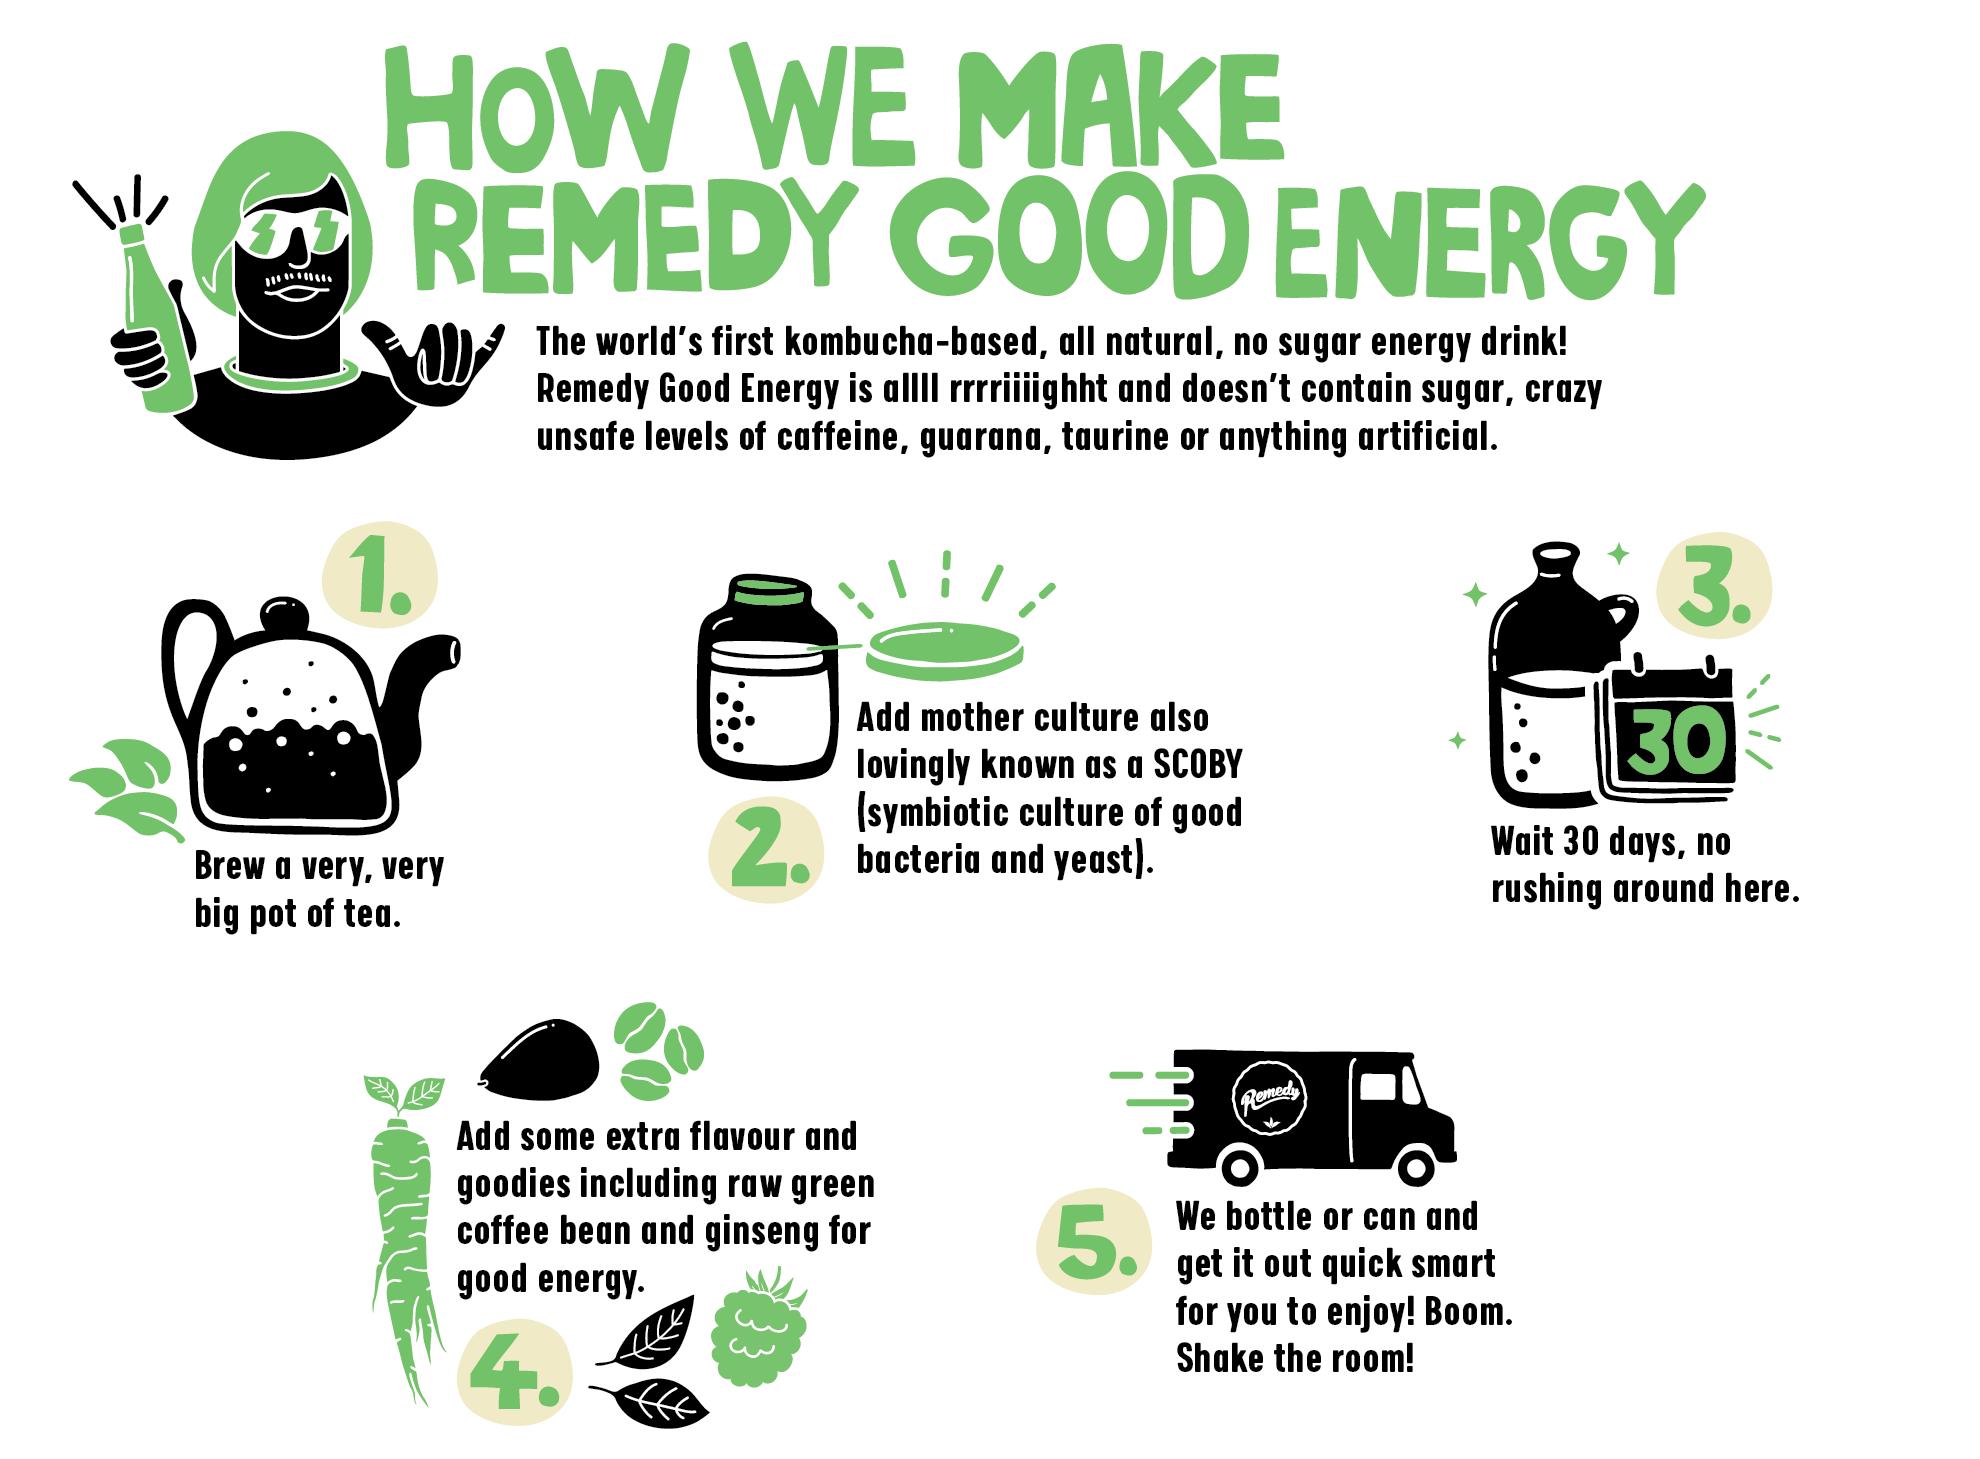 Remedy Good Energy Process